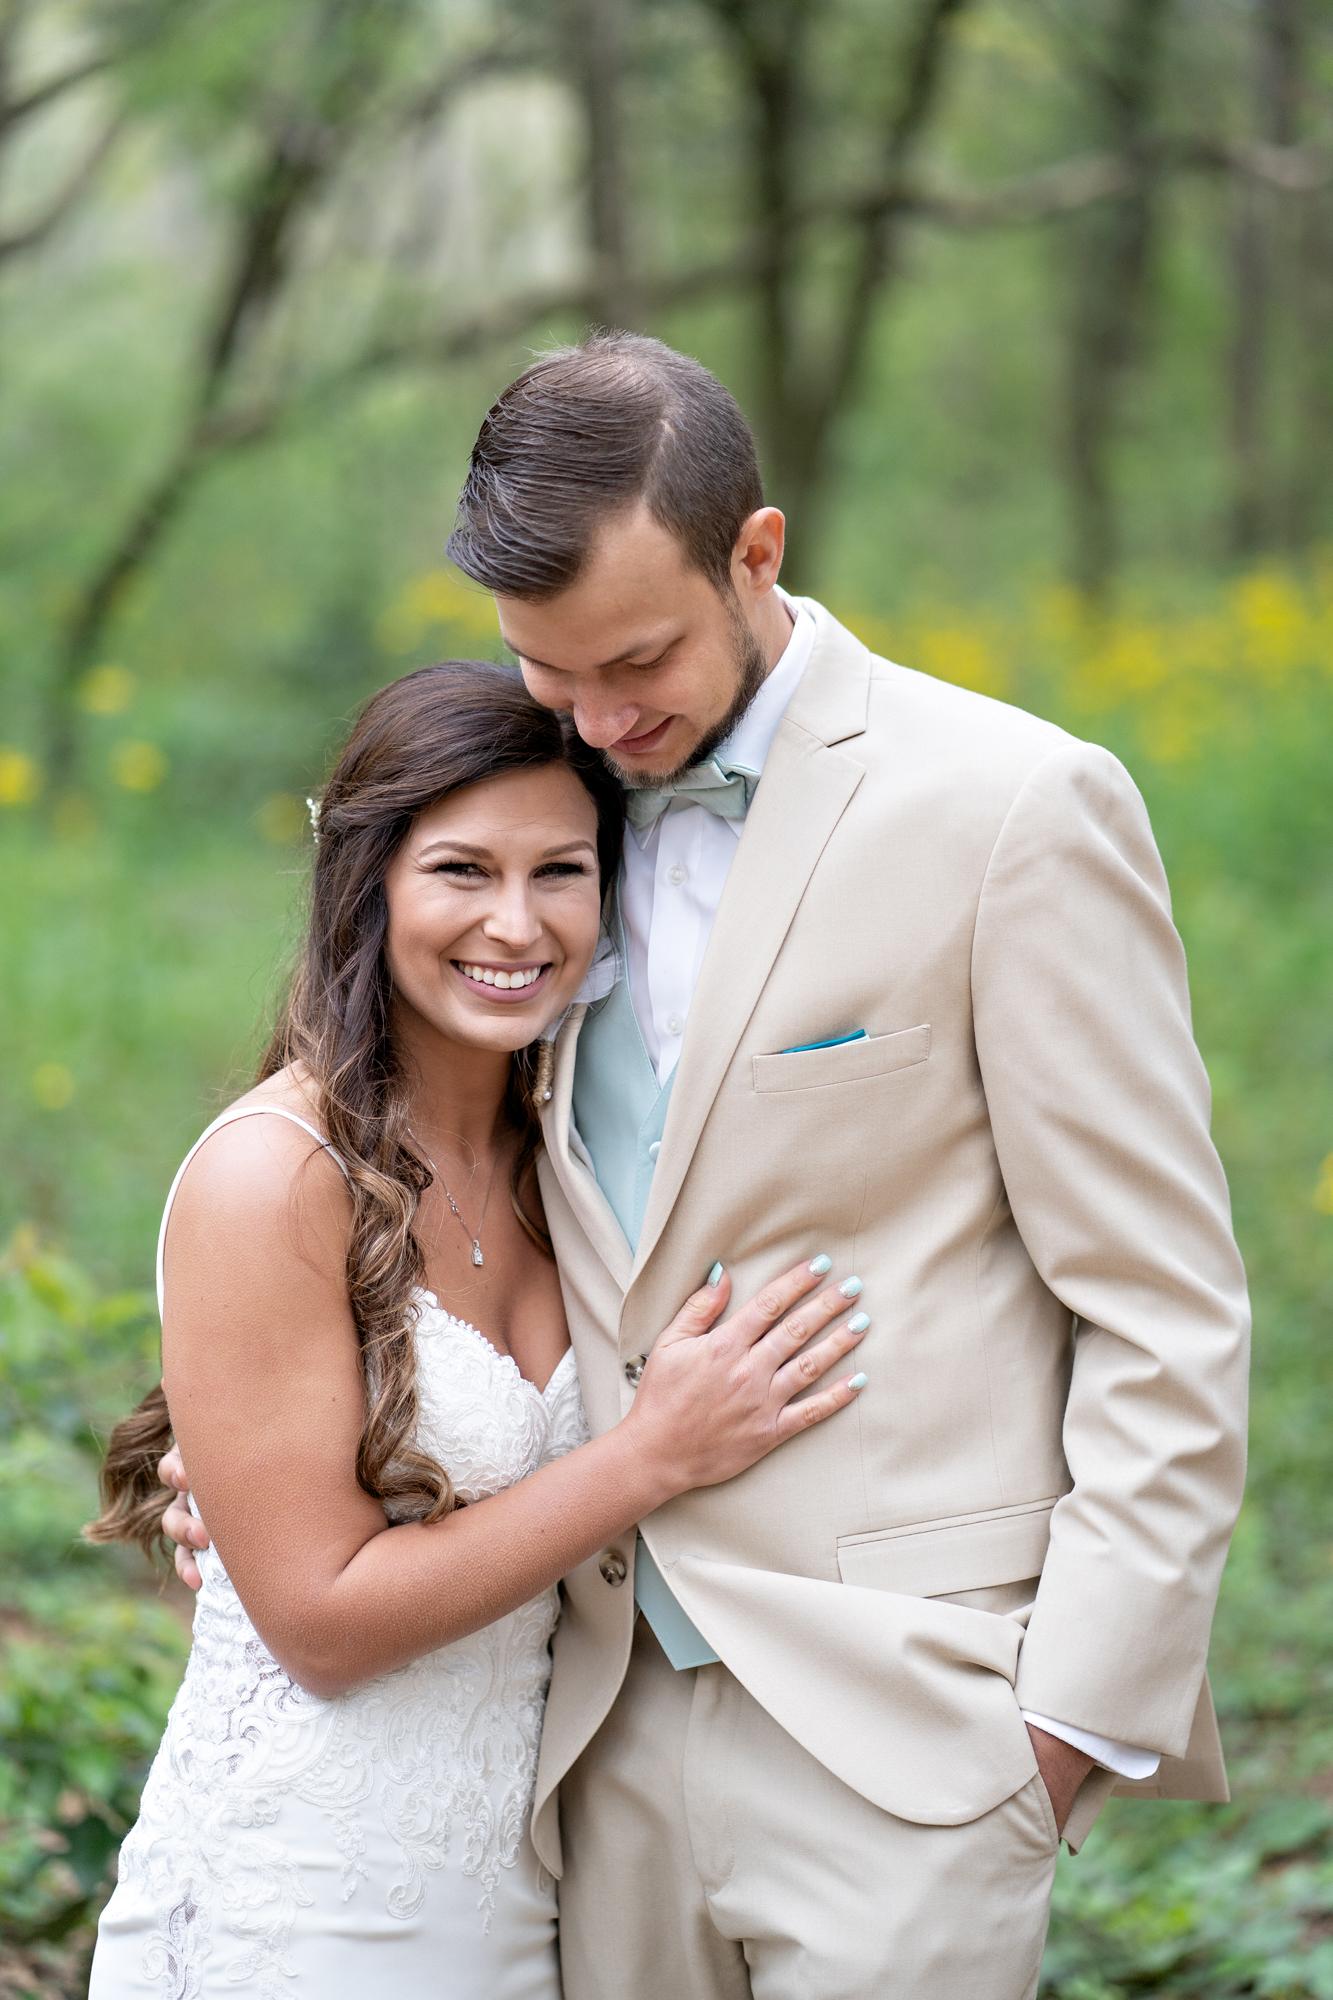 Fairhope-Alabama-Wedding-Photographers-Nick-Drollette-Photography-144.jpg